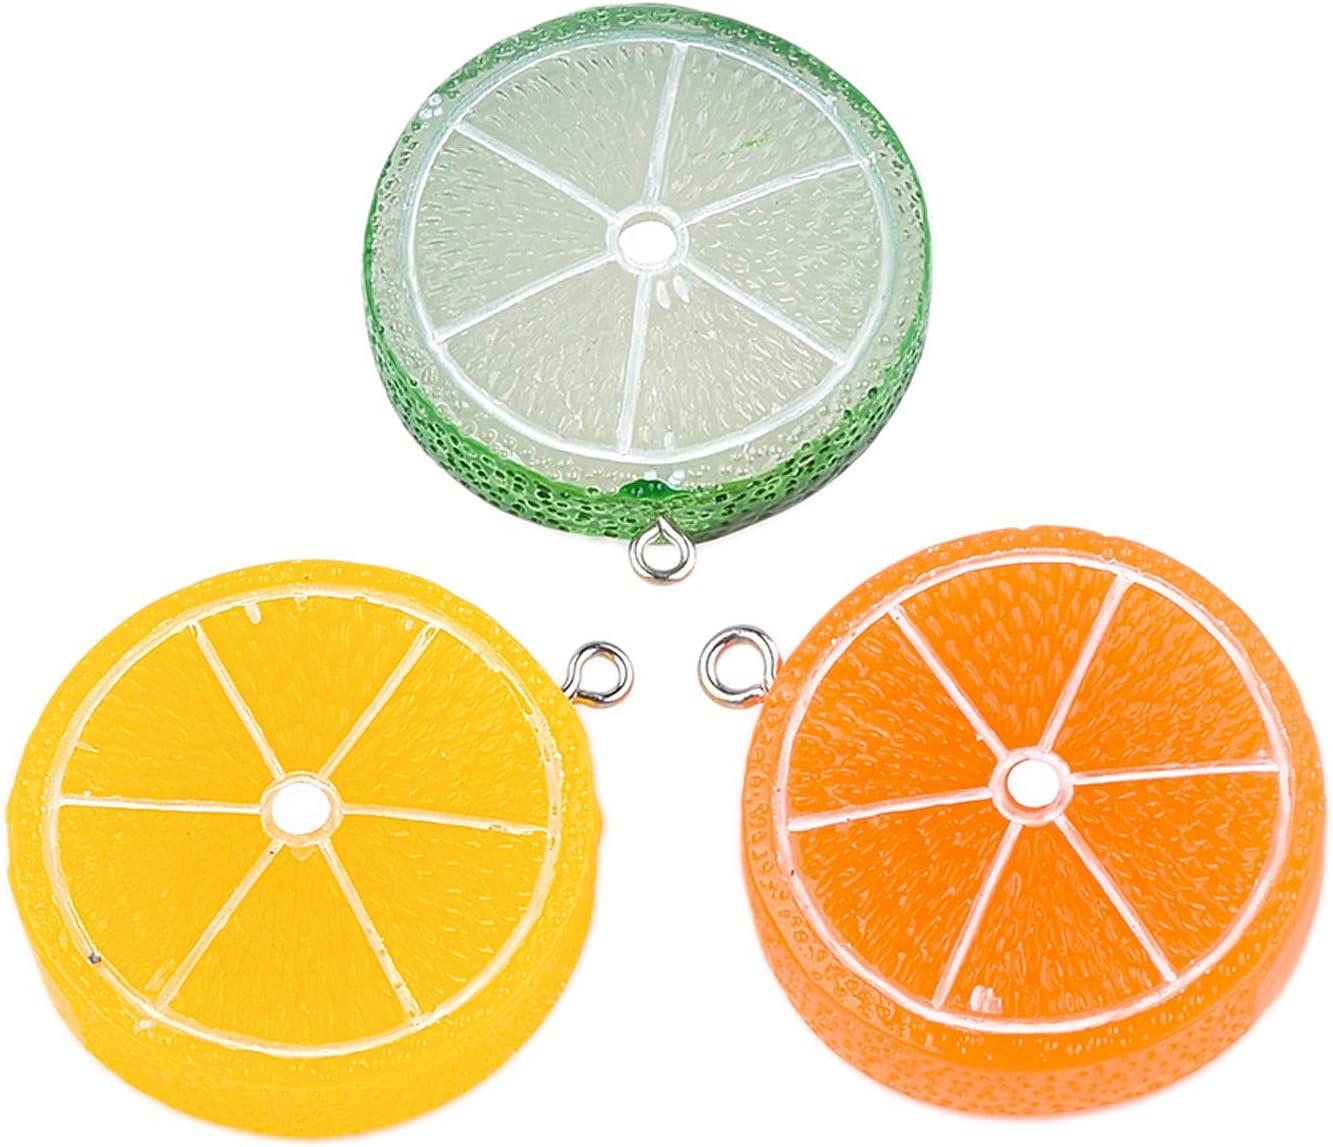 PH PandaHall 5pcs Lemon Resin Pendants Charms Mixed Colors Imitation Food Fruit Pendants Resin Charms Beads Hanging Ornament for Earring Bracelet Necklace Jewelry Making